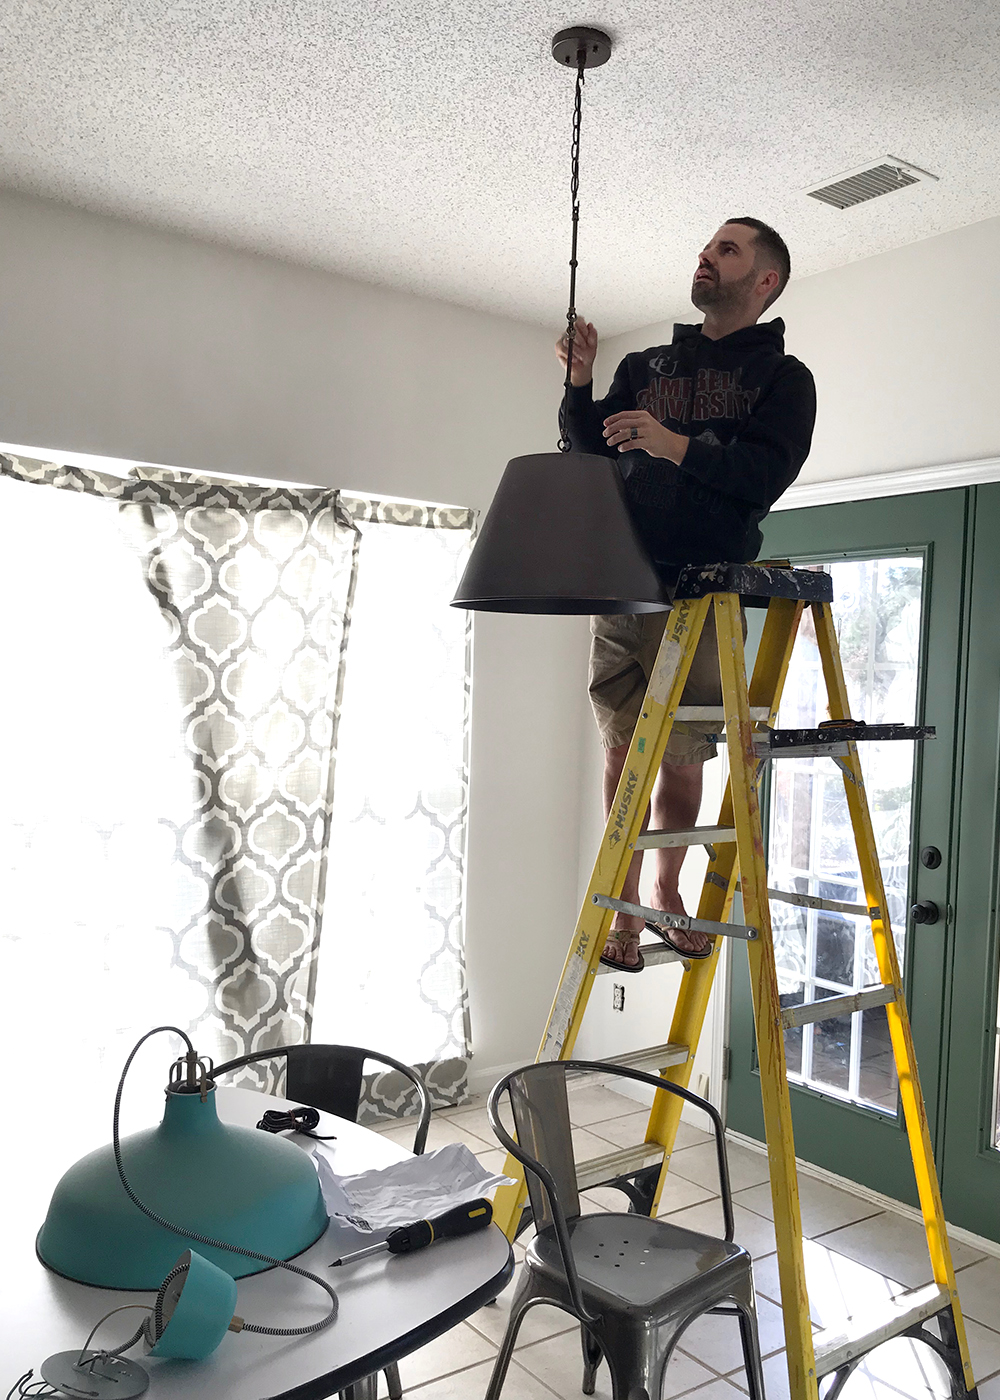 hanginglight.jpg